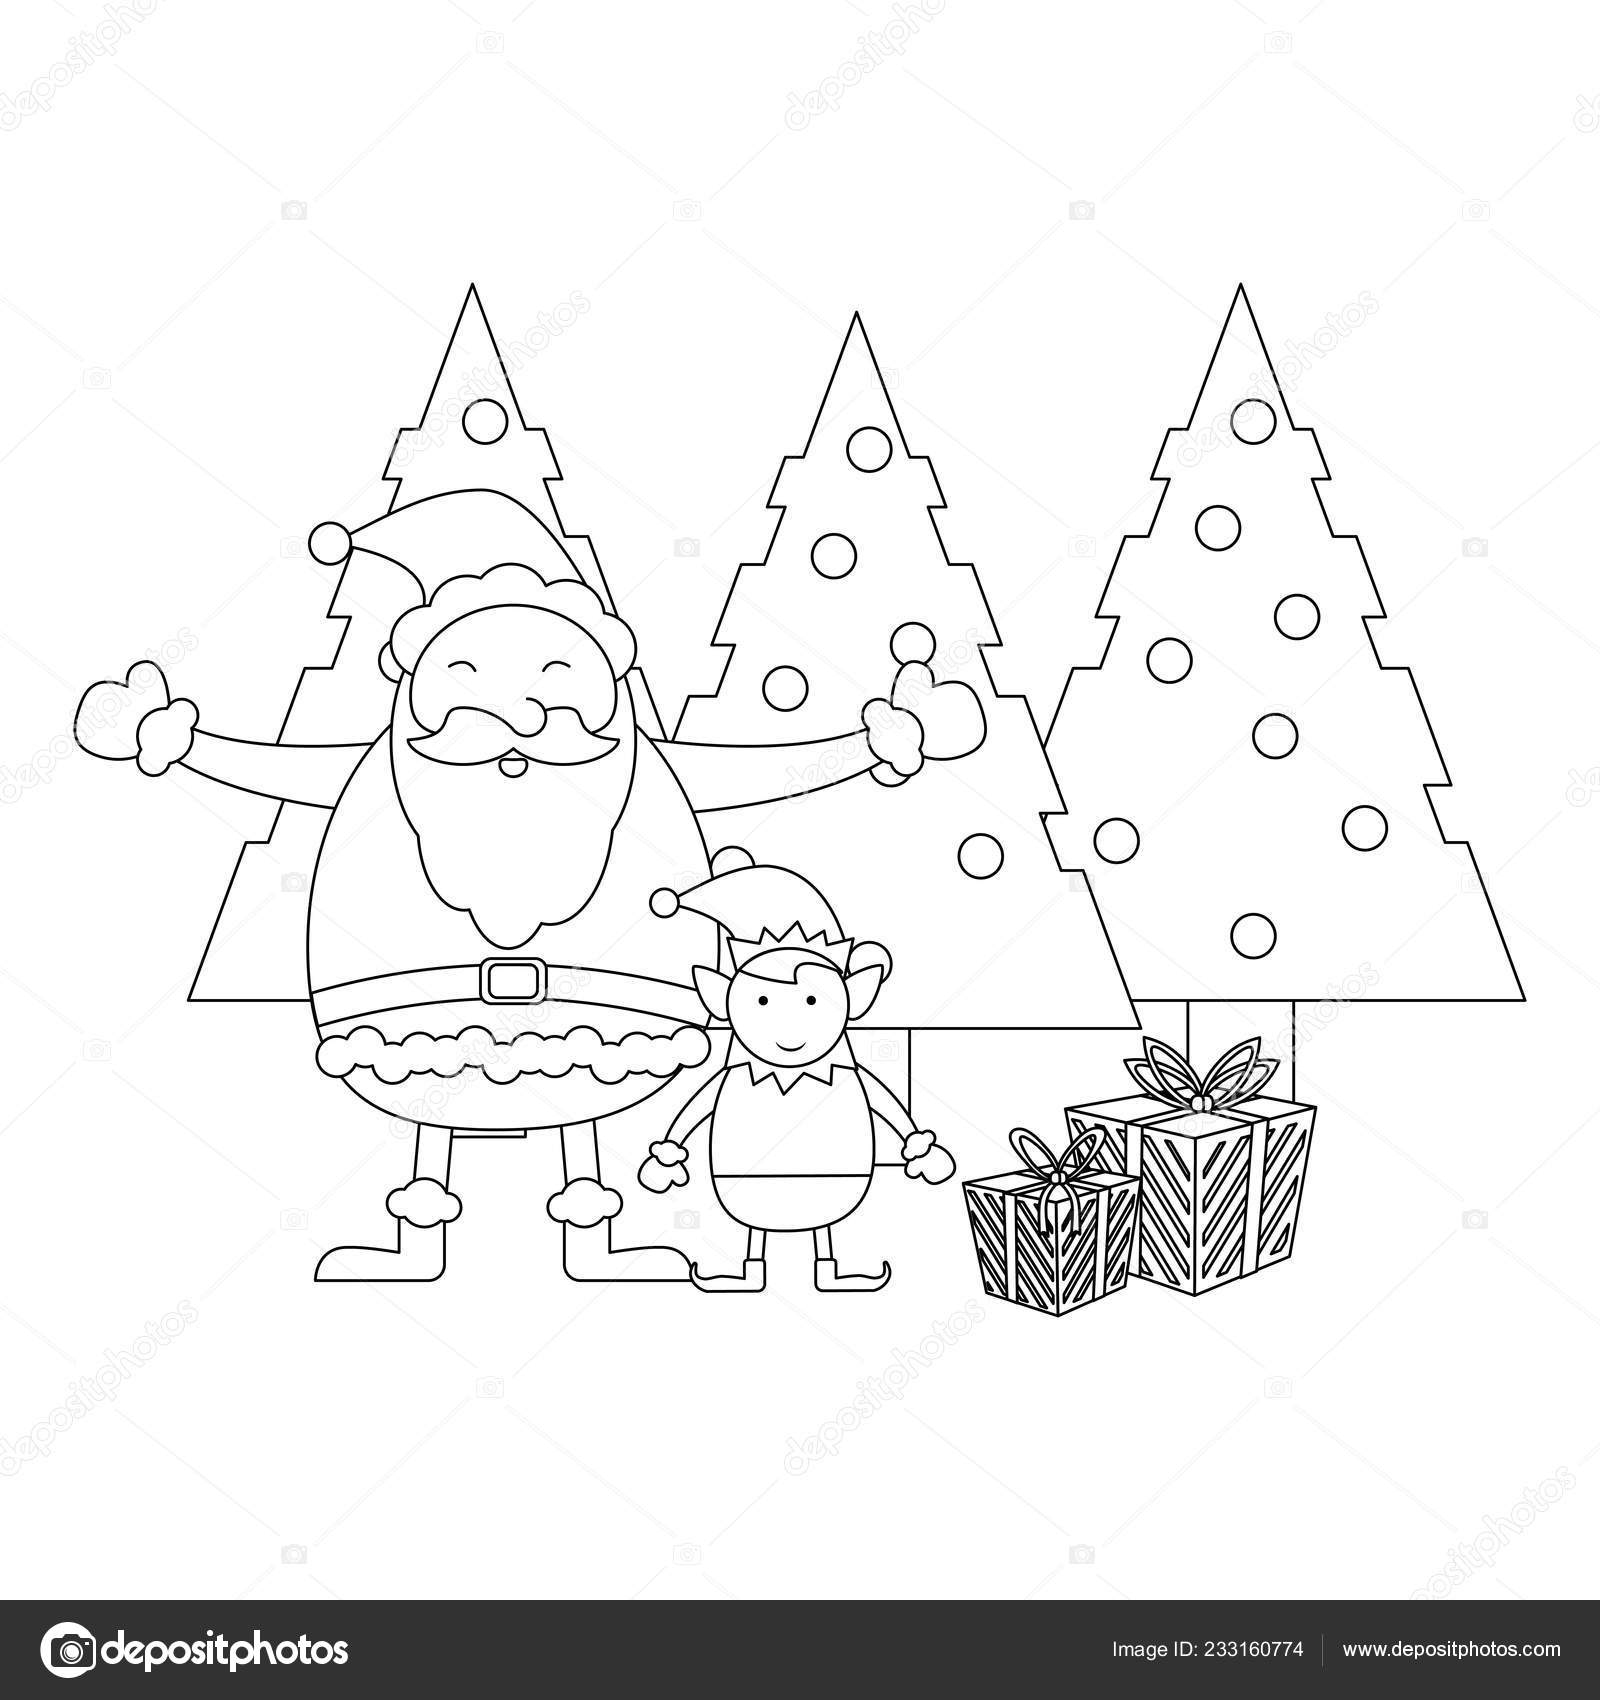 christmas santa claus cartoon black and white stock vector c jemastock 233160774 https depositphotos com 233160774 stock illustration christmas santa claus cartoon black html